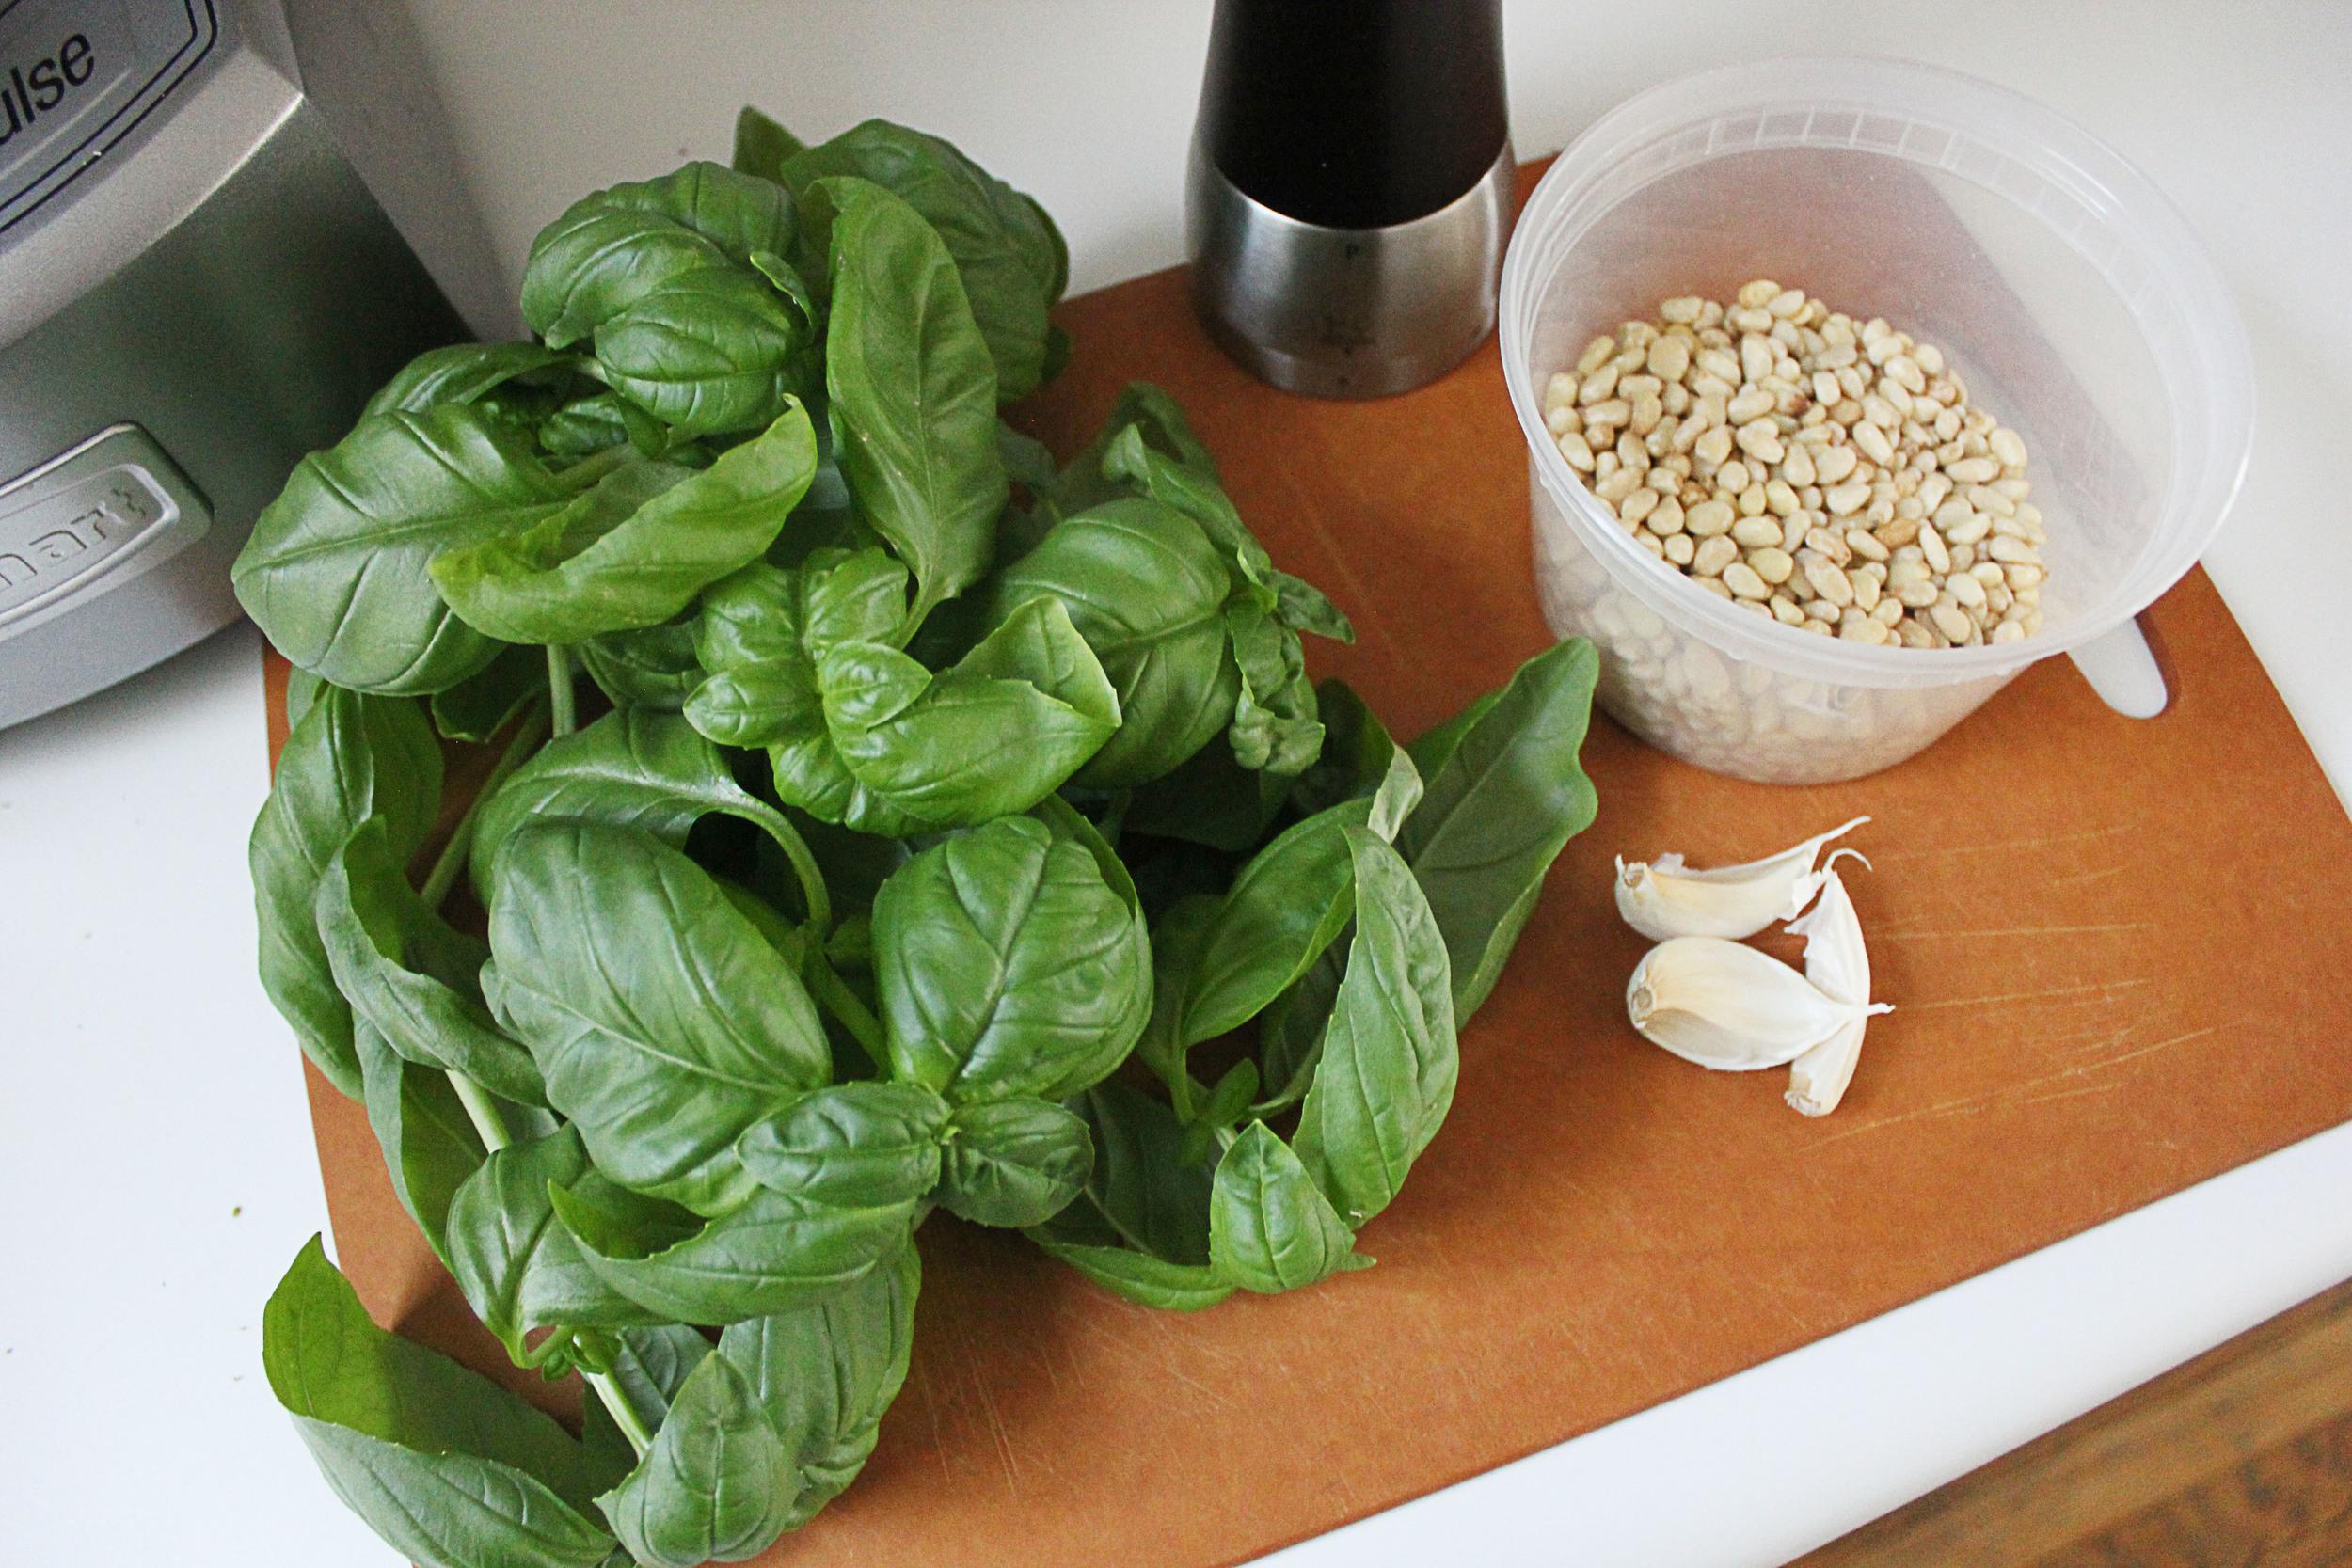 Michael Chiarello's basil pesto ingredients